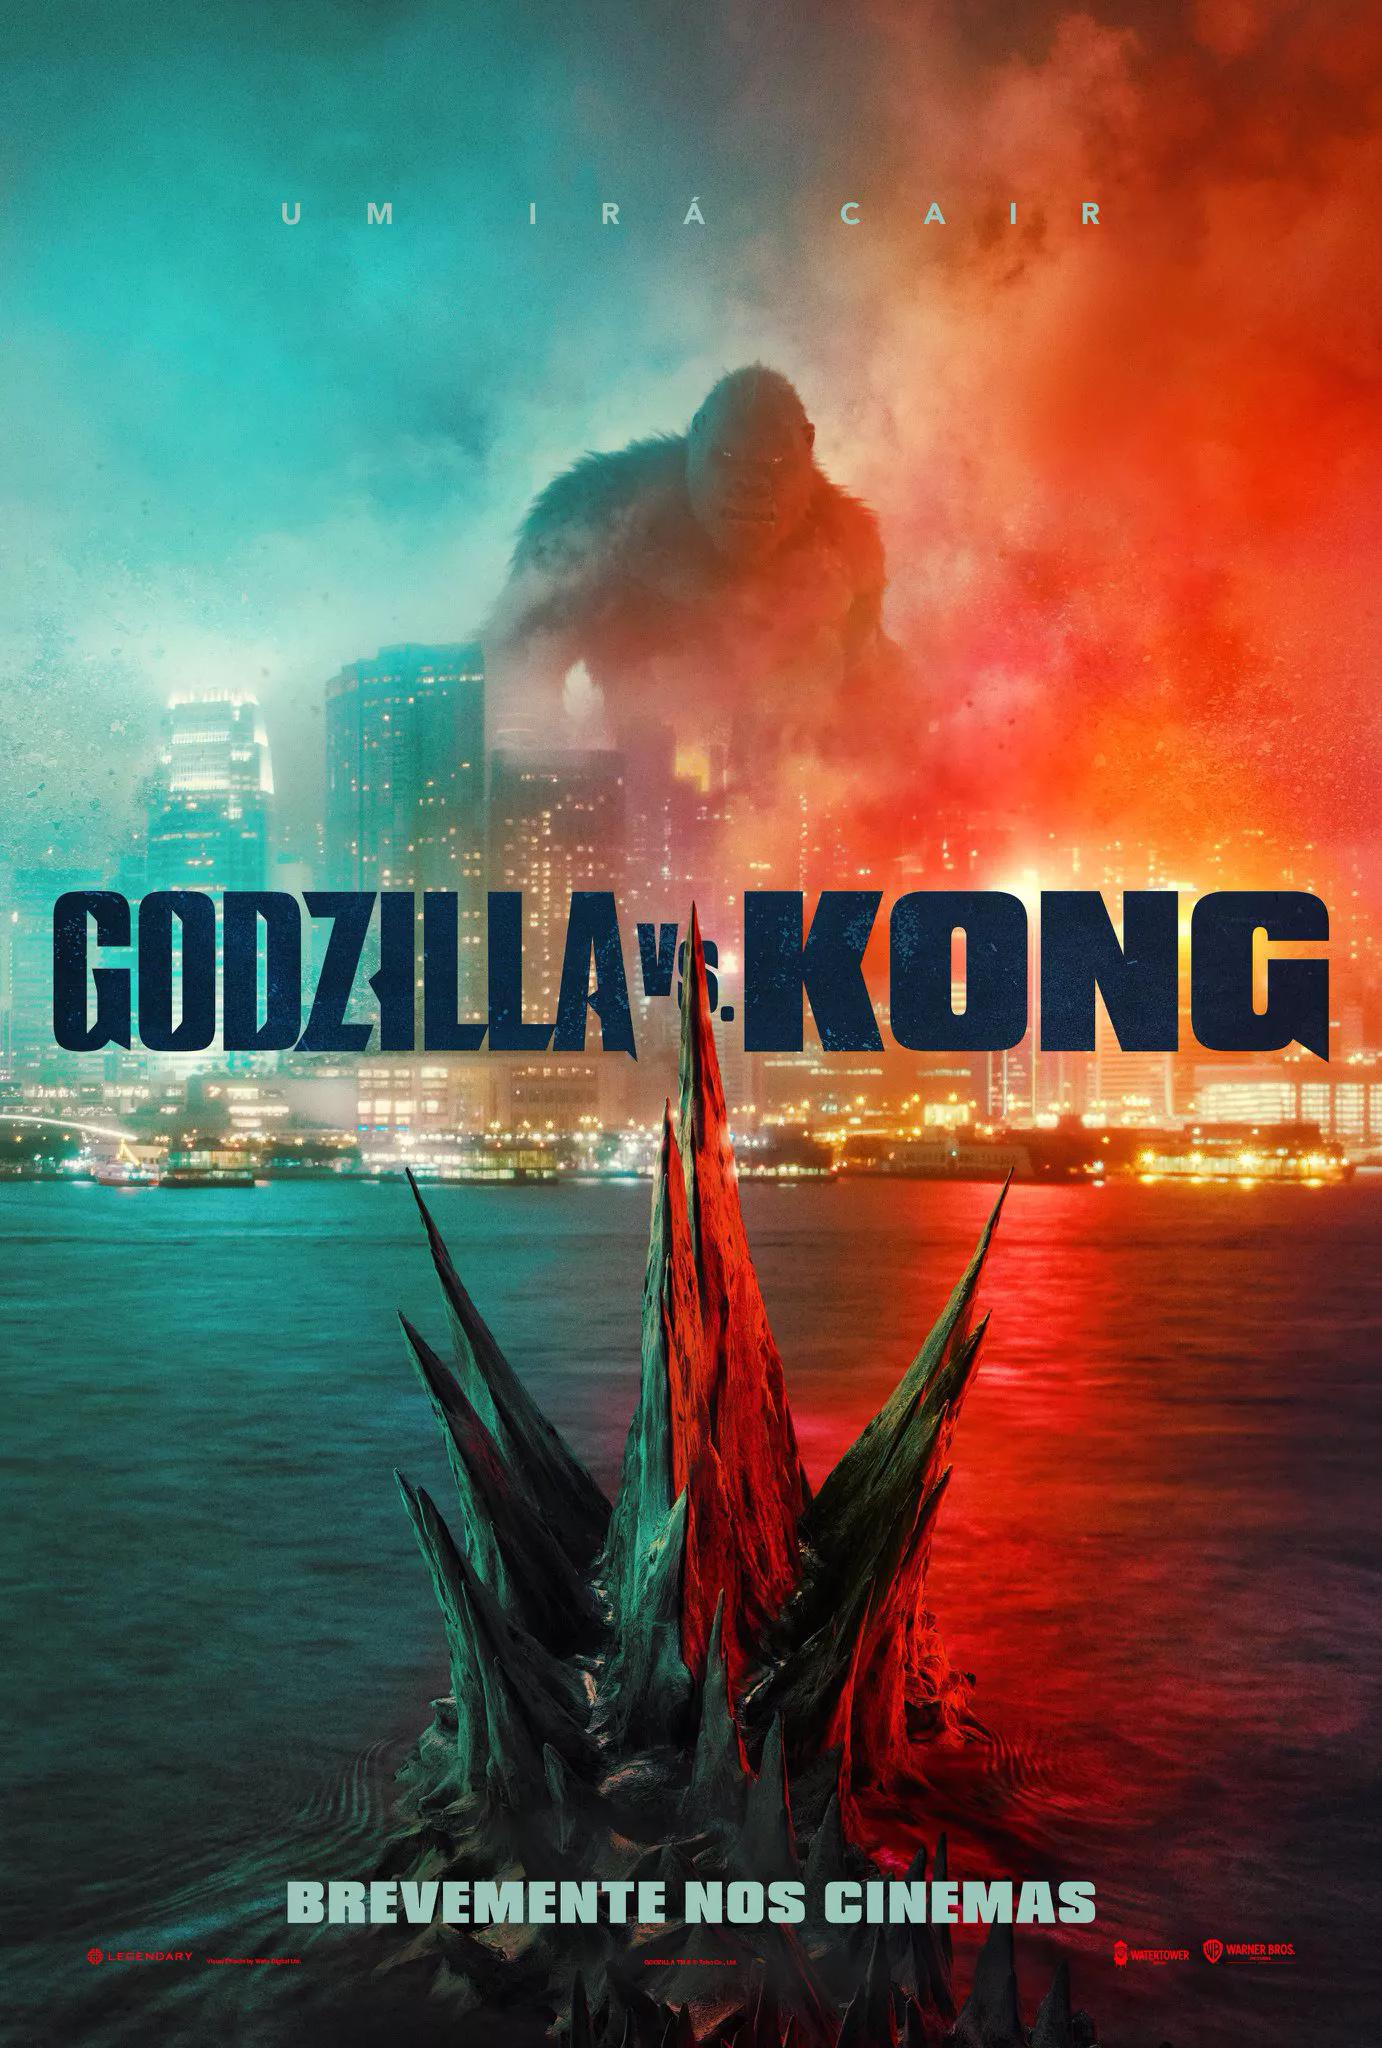 CINEMA - GODZILLA VS. KONG